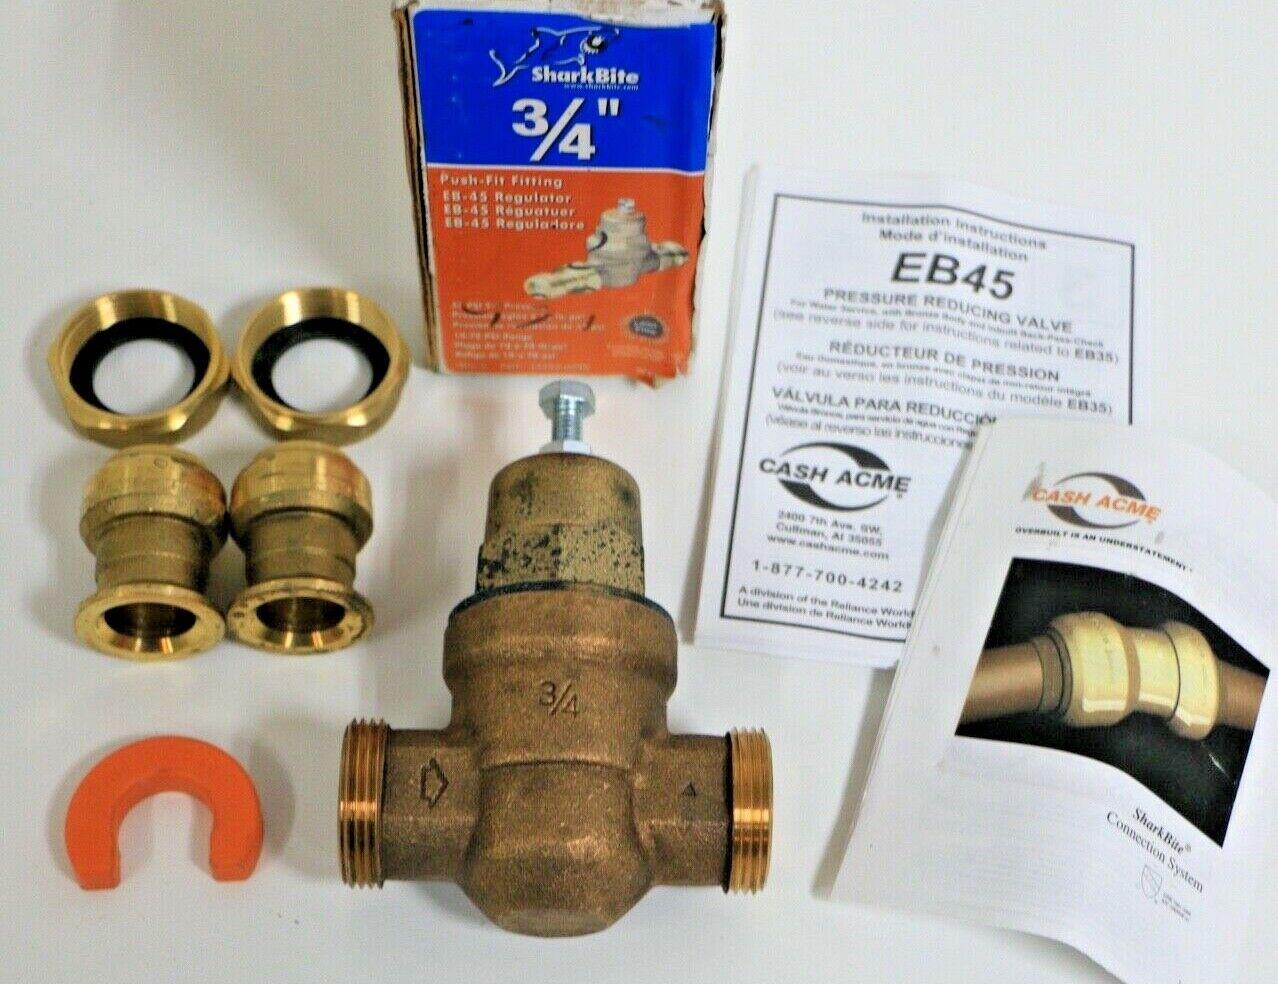 EB25-DUSB Double Union Shark Bite Cash Acme 23955-0045 Pressure Regulator 3//4